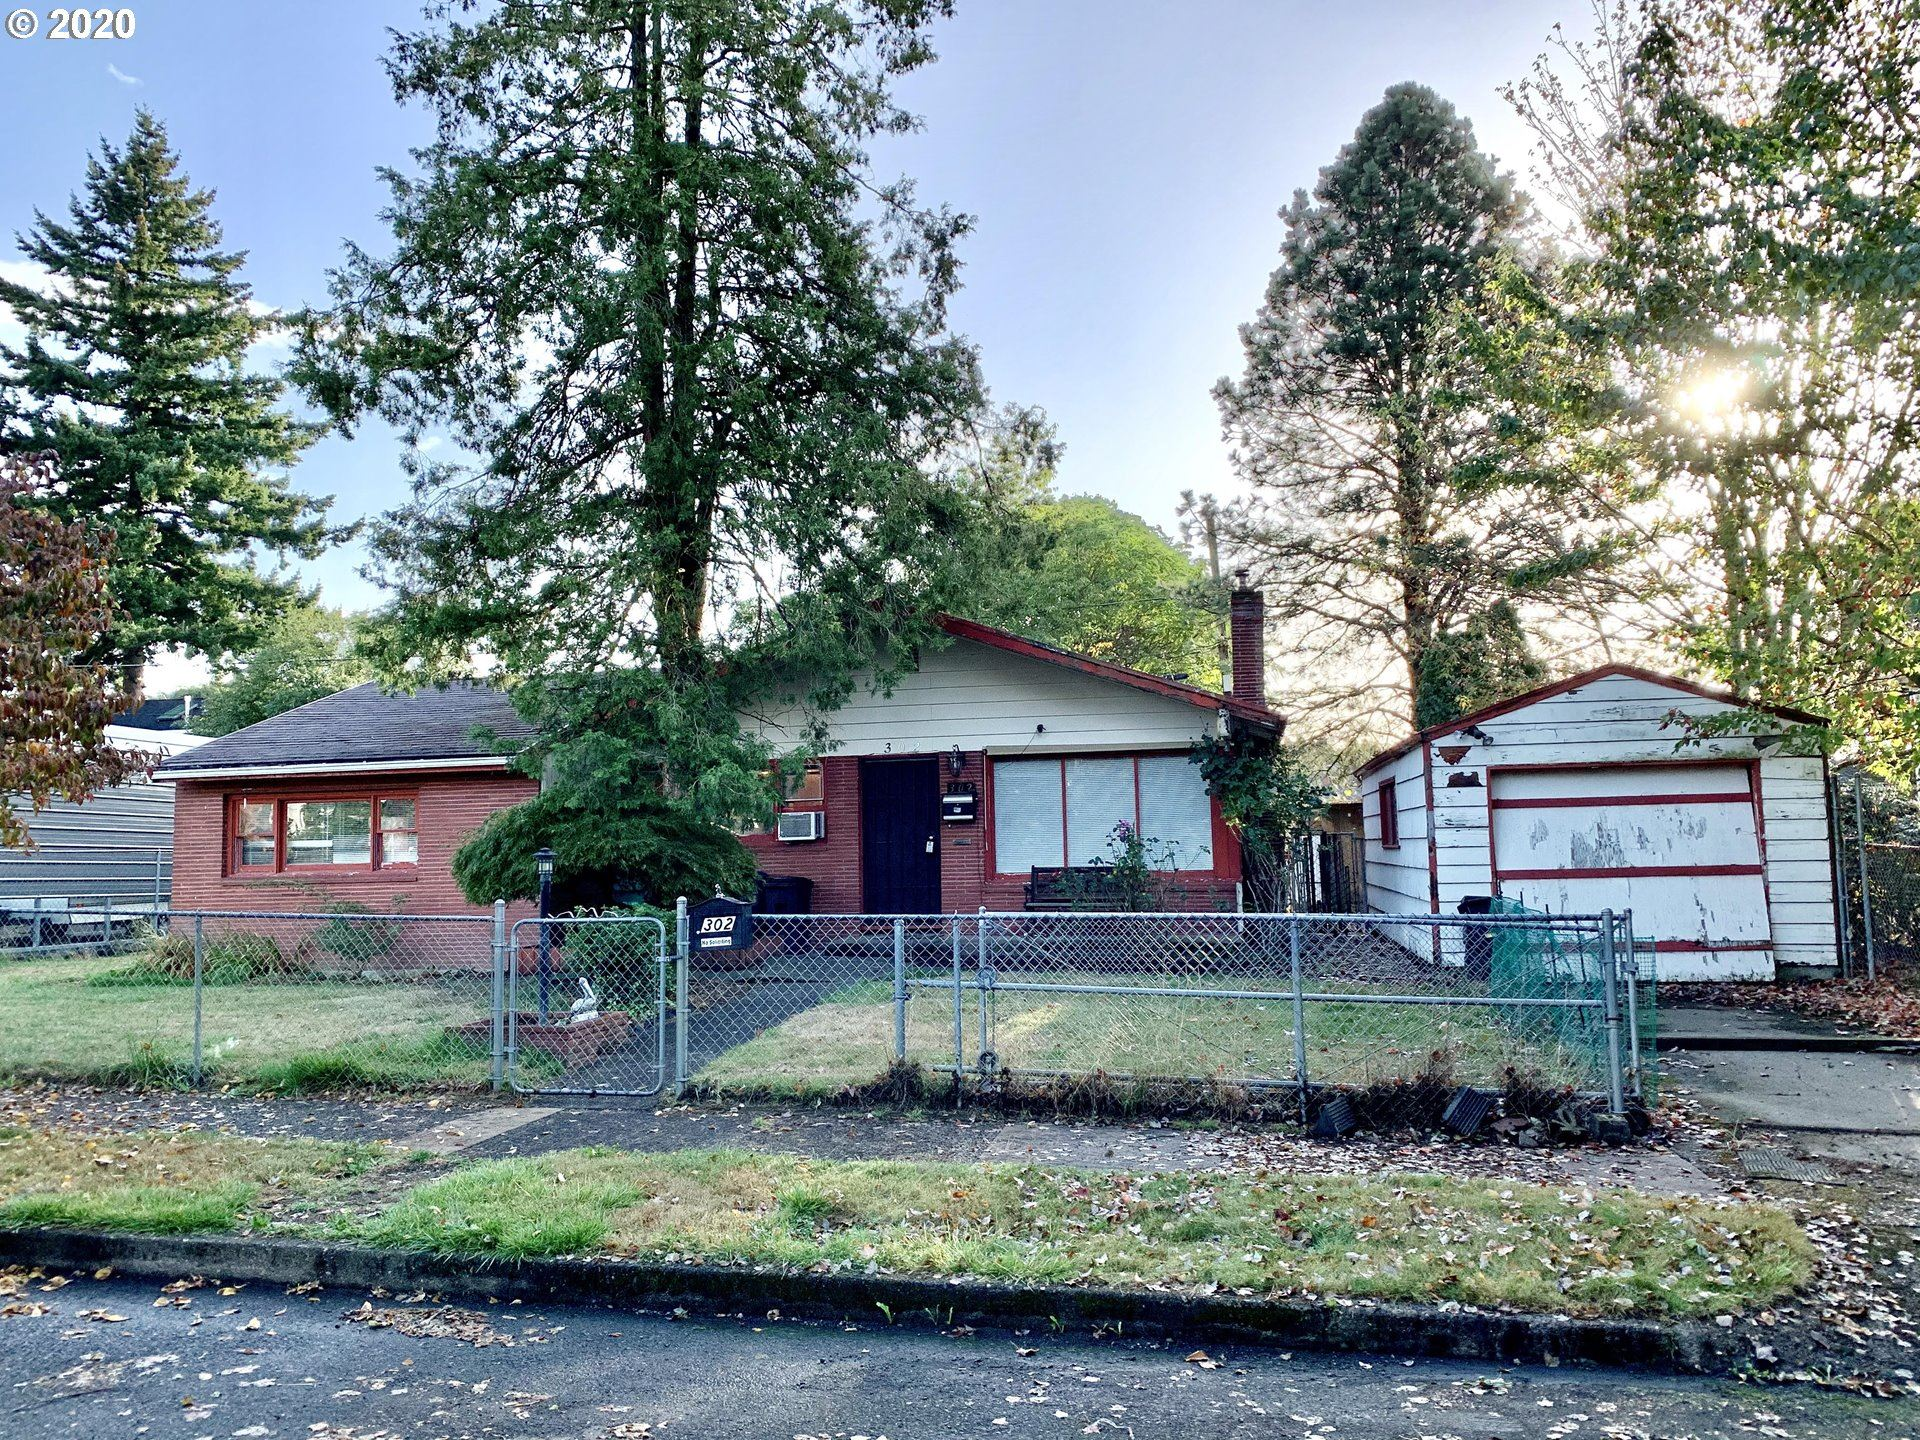 302 SE 93RD AVE, Portland, OR 97216 - MLS#: 20293319